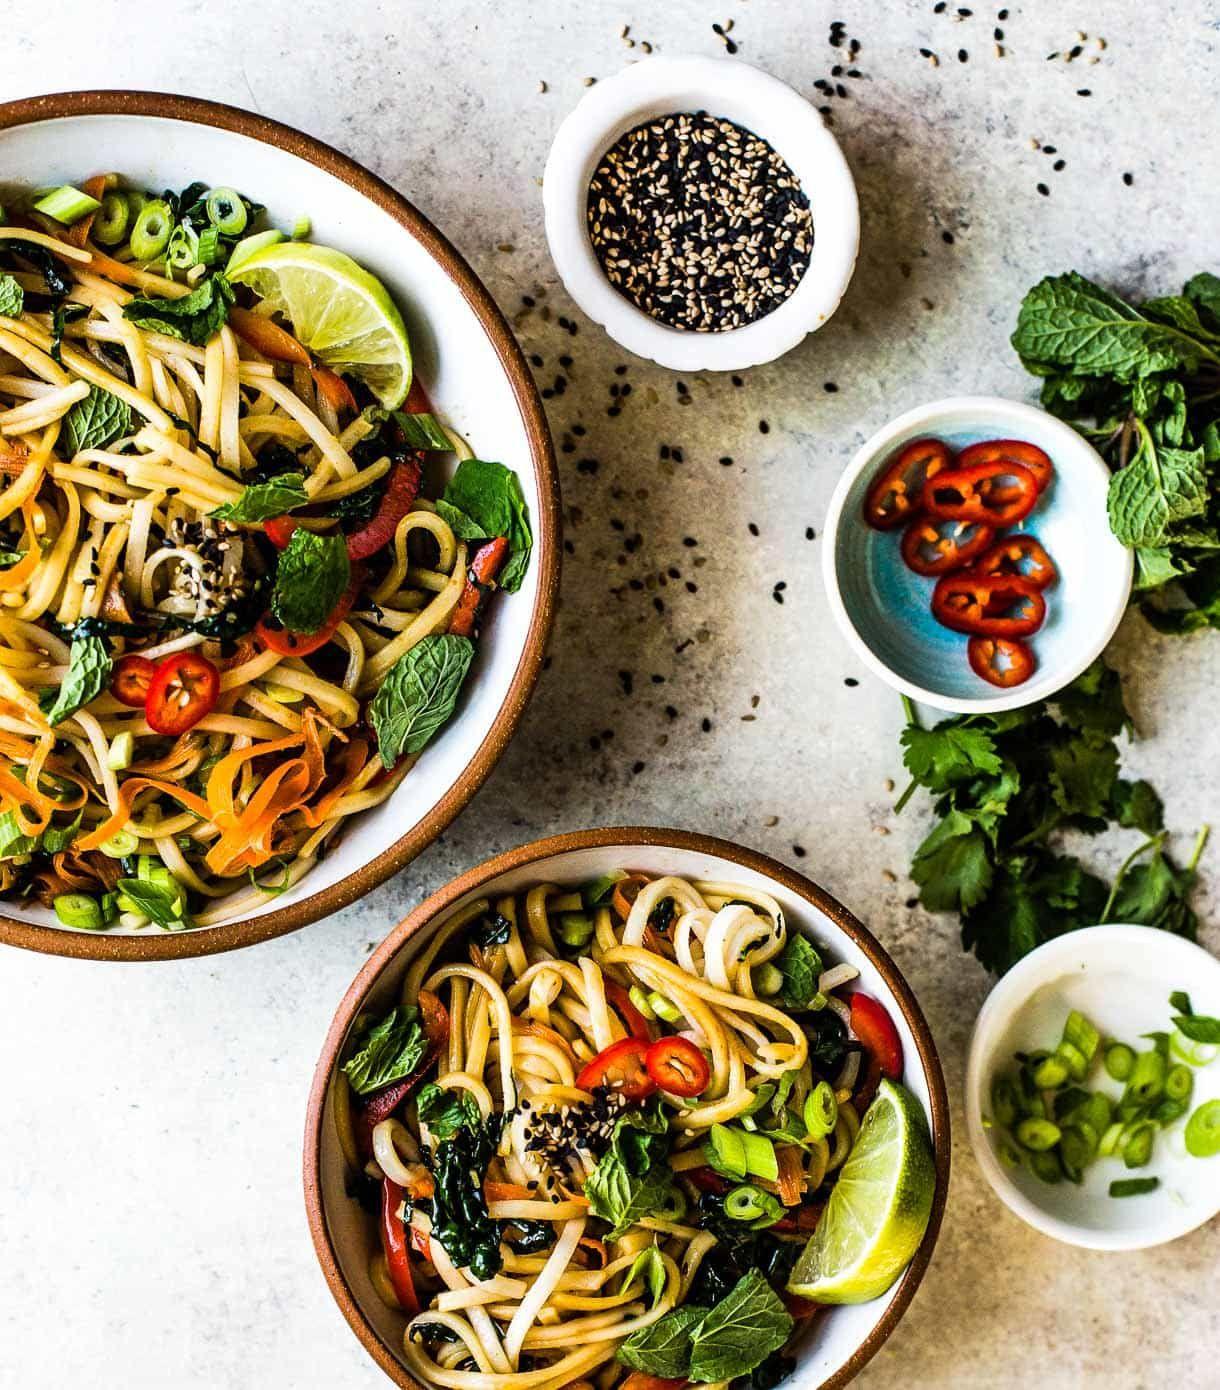 Sesame Thai Rice Noodles With Vegetables Vegan Recipe Recipe In 2020 Rice Noodles Vegetarian Recipes Dinner Thai Rice Noodles